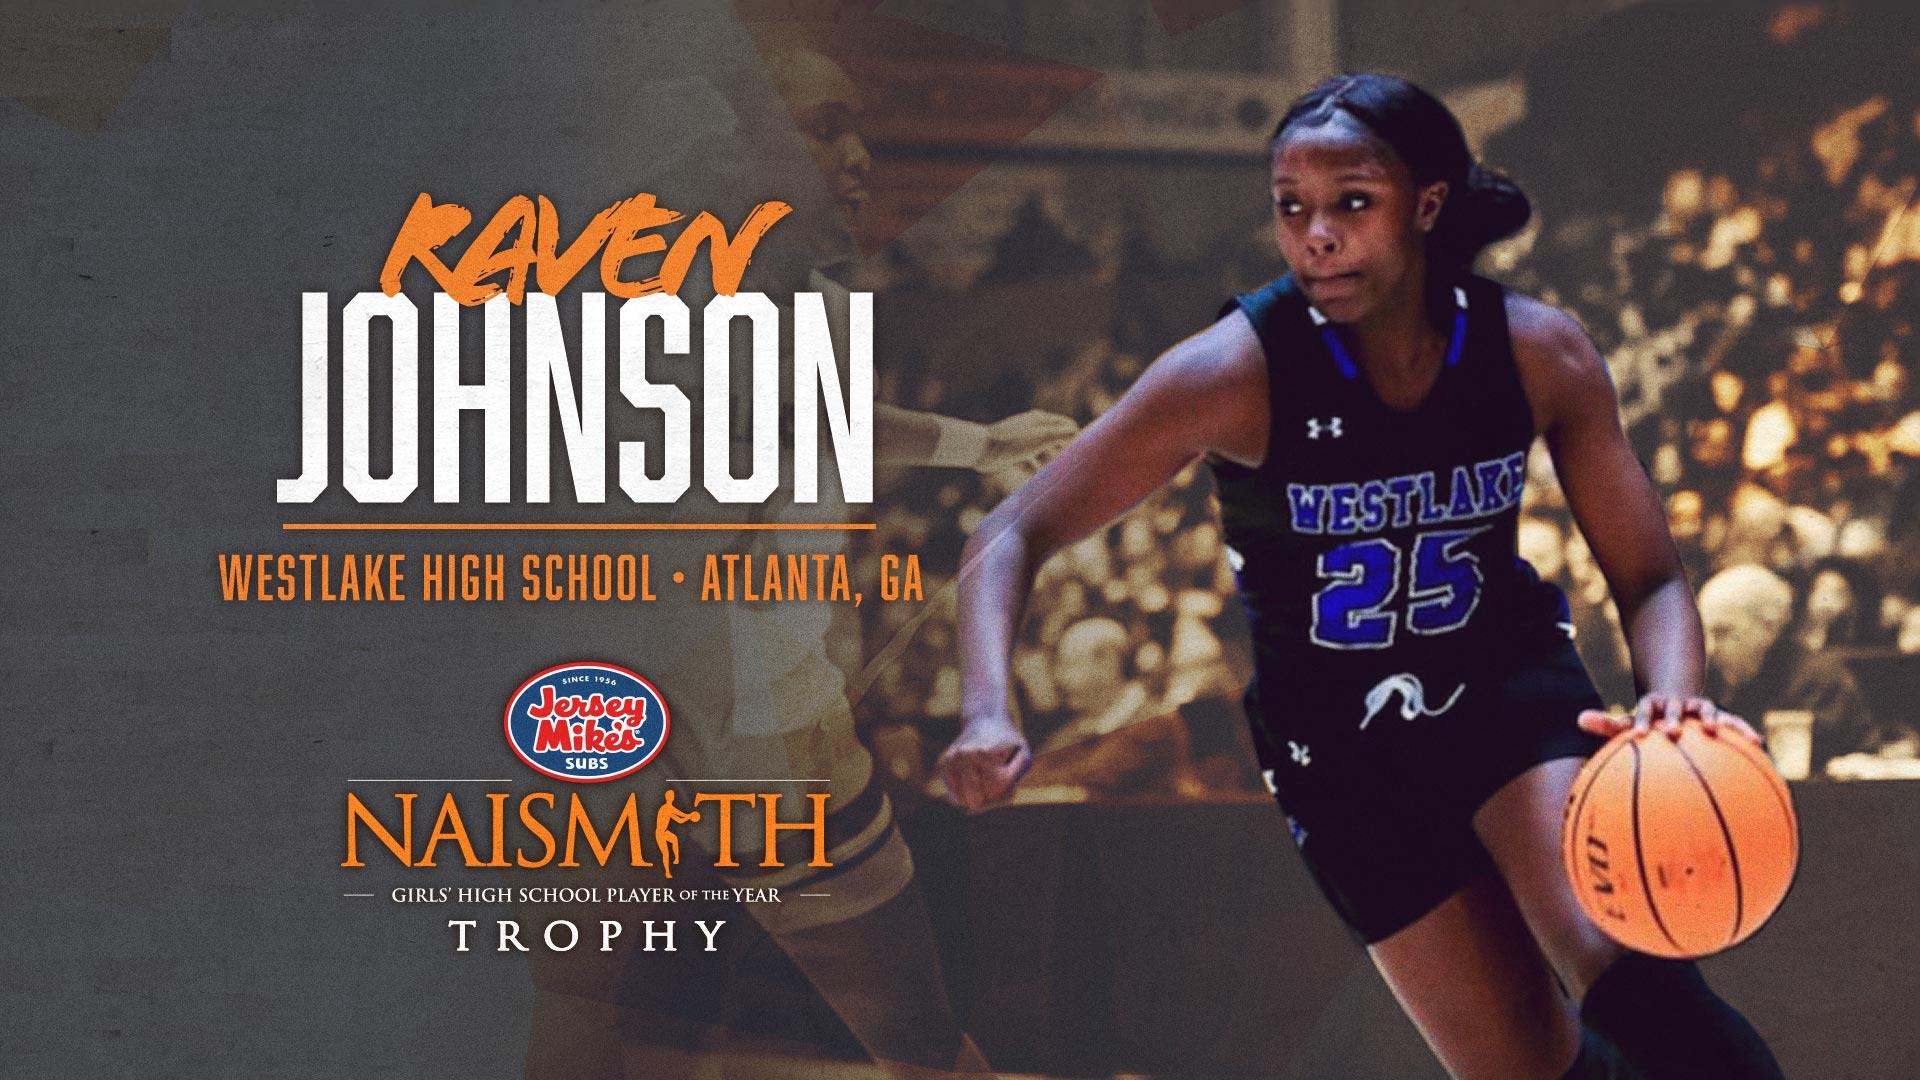 Raven Johnson